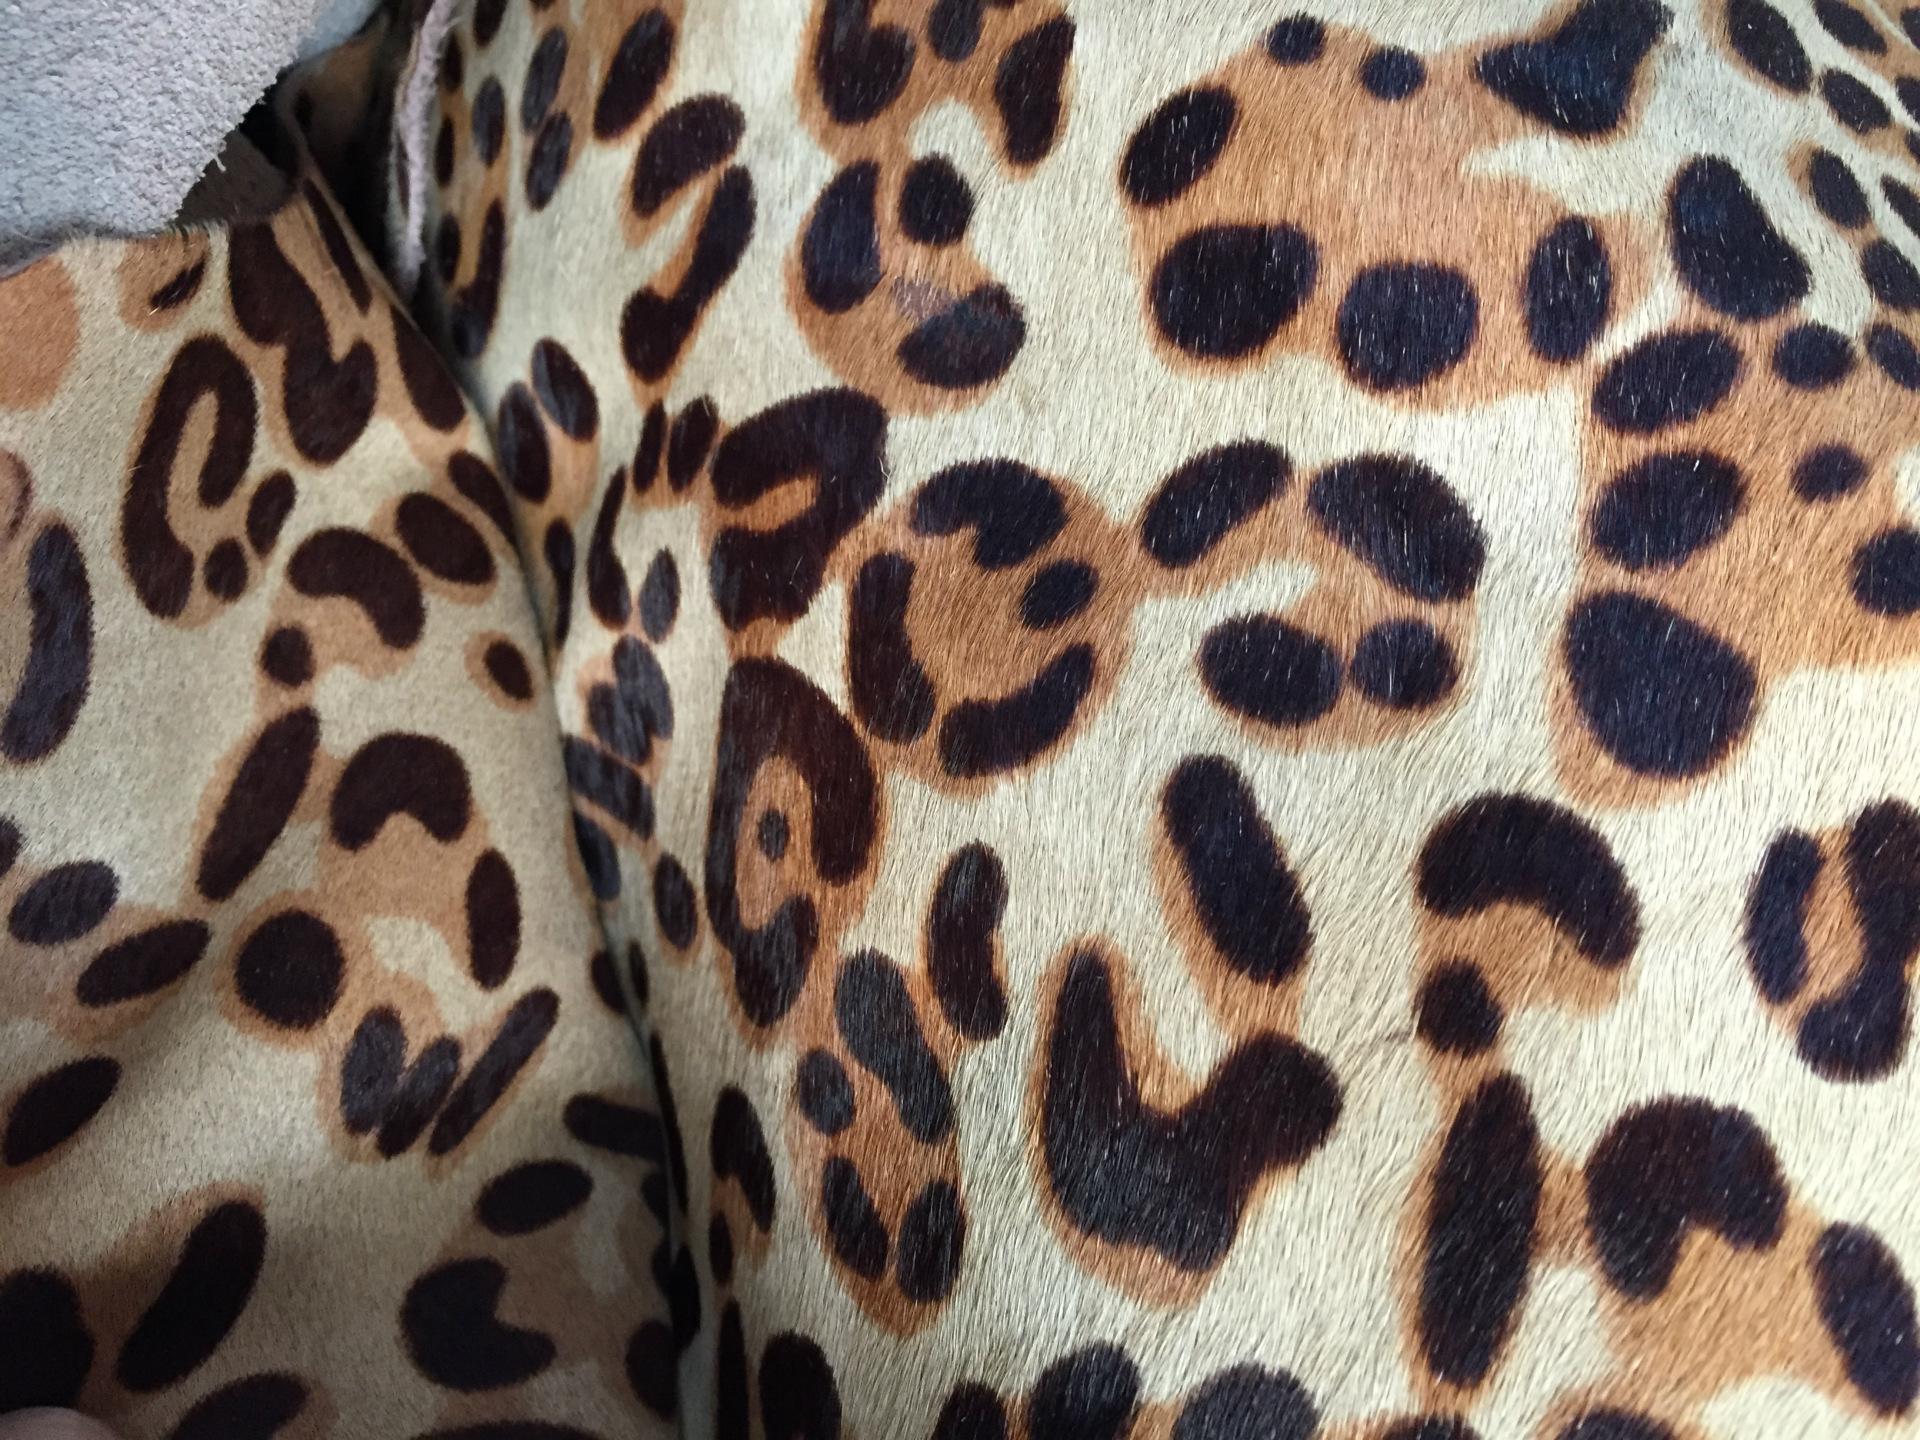 Da ngựa   Yiwu really Pima hair leopard pony zebra cows one thousand Bird horsehair horsehide monoch